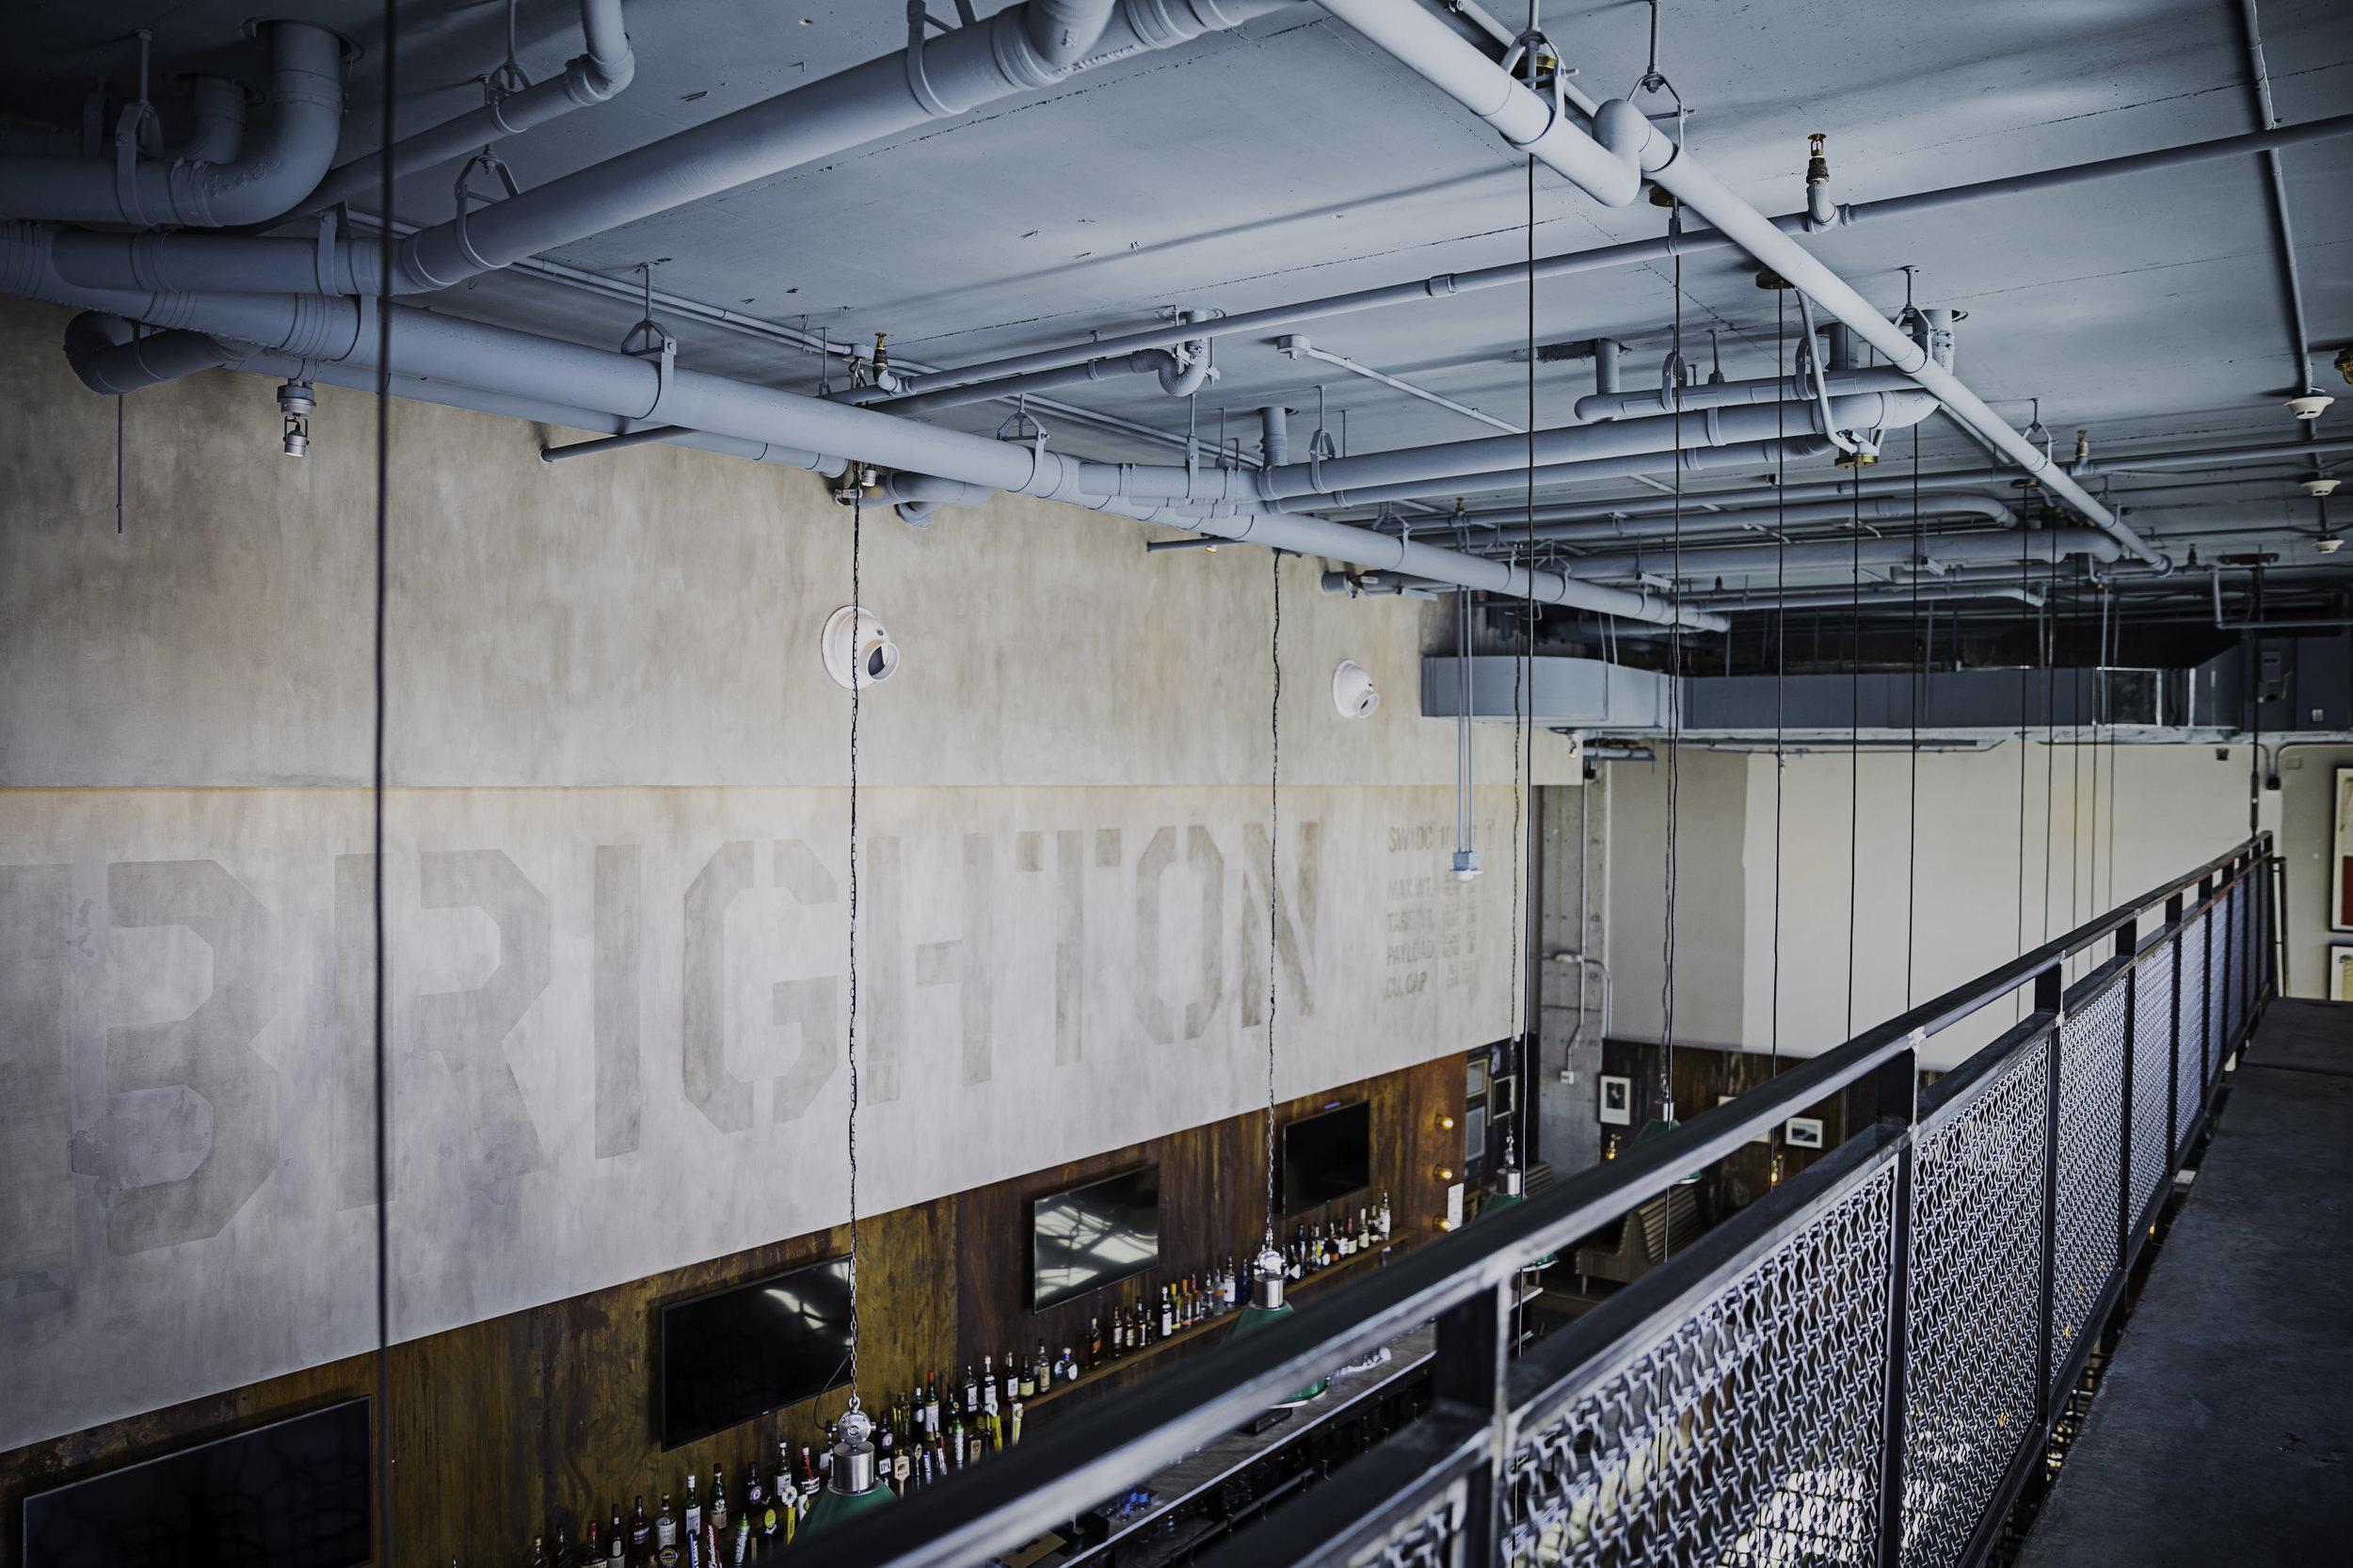 studio-saint-bars-and-restaurants-the-brighton-washington-dc-4